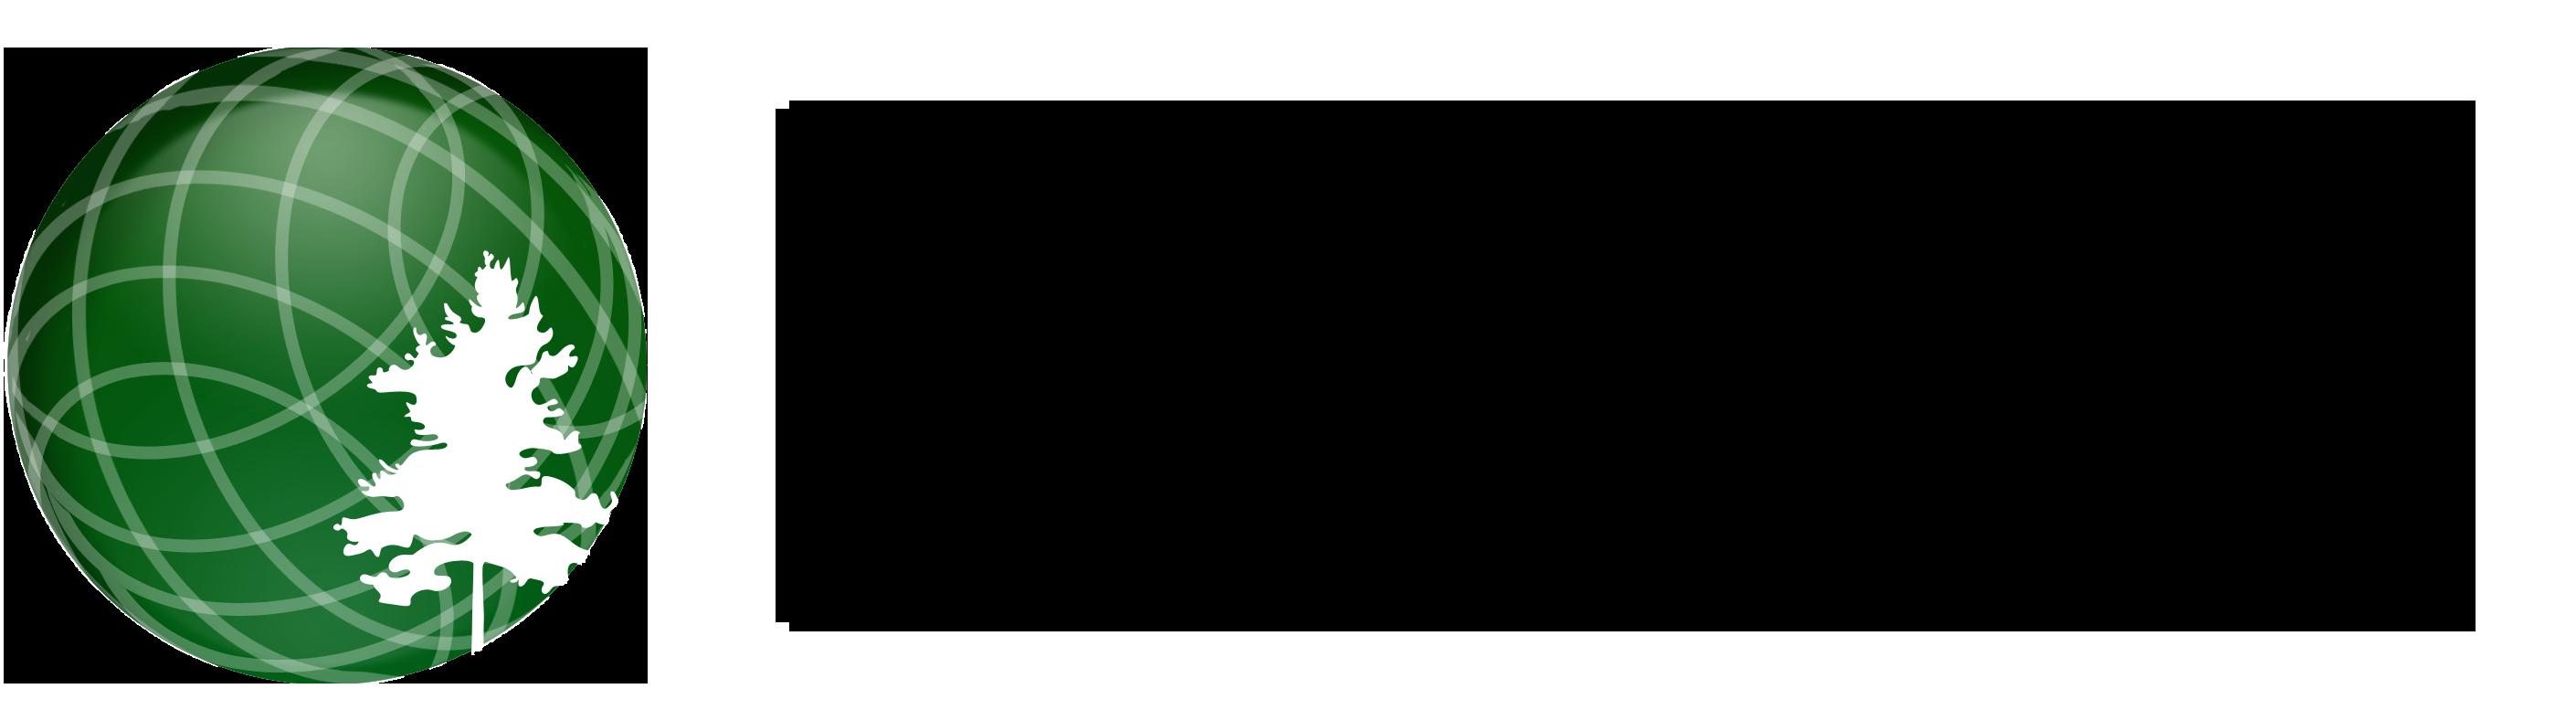 NCX logo